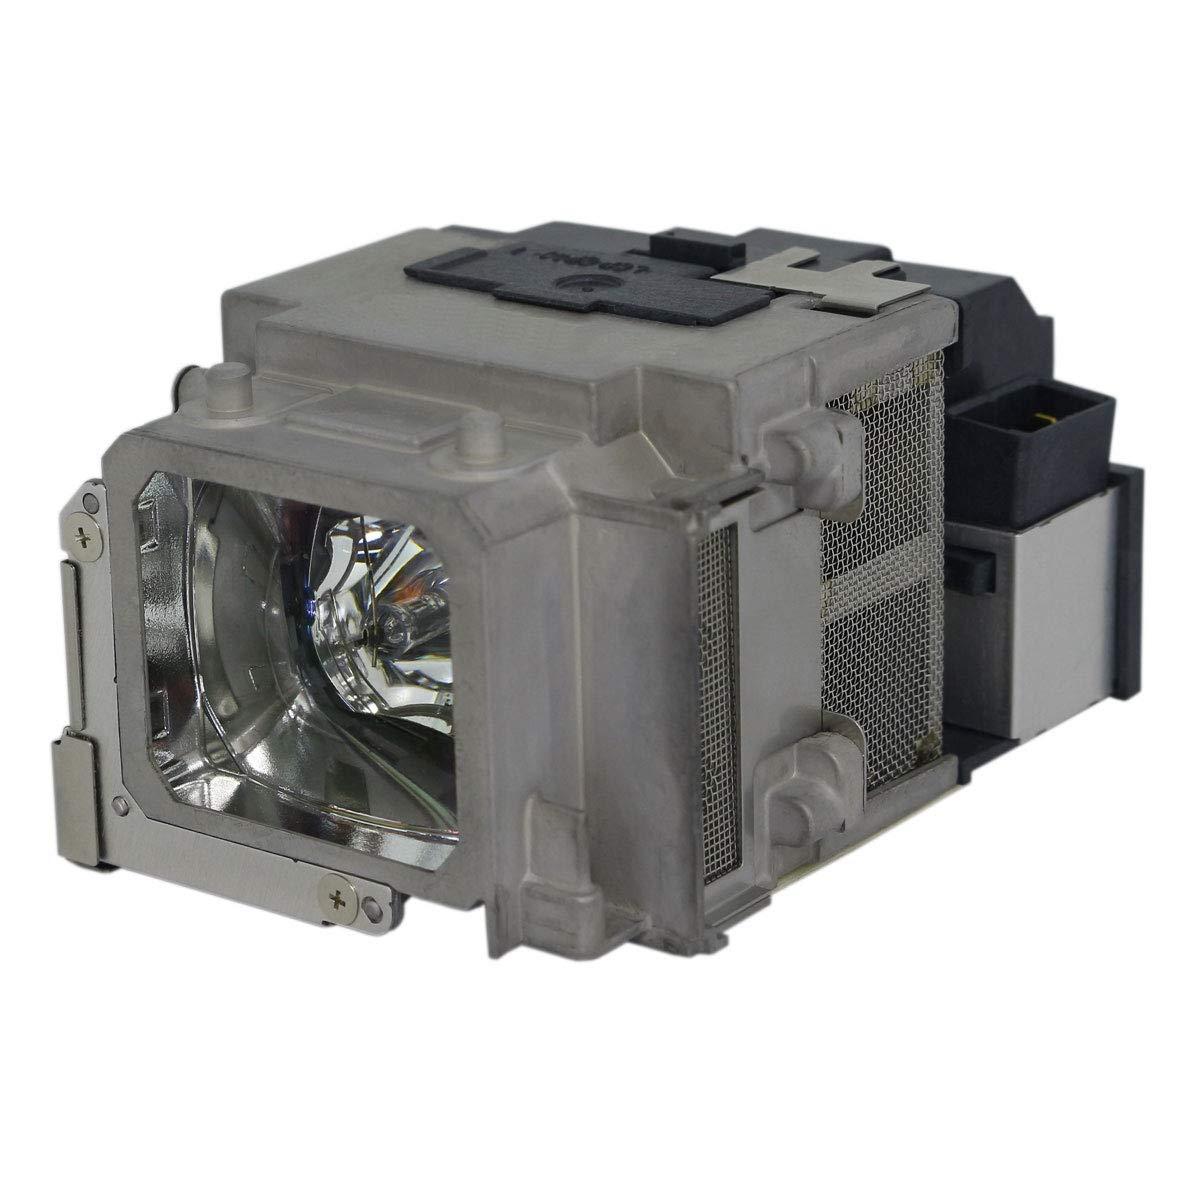 XpertMall EB-179x用交換用ランプとハウジング、純正OEM電球内蔵 B07QG4CVVQ